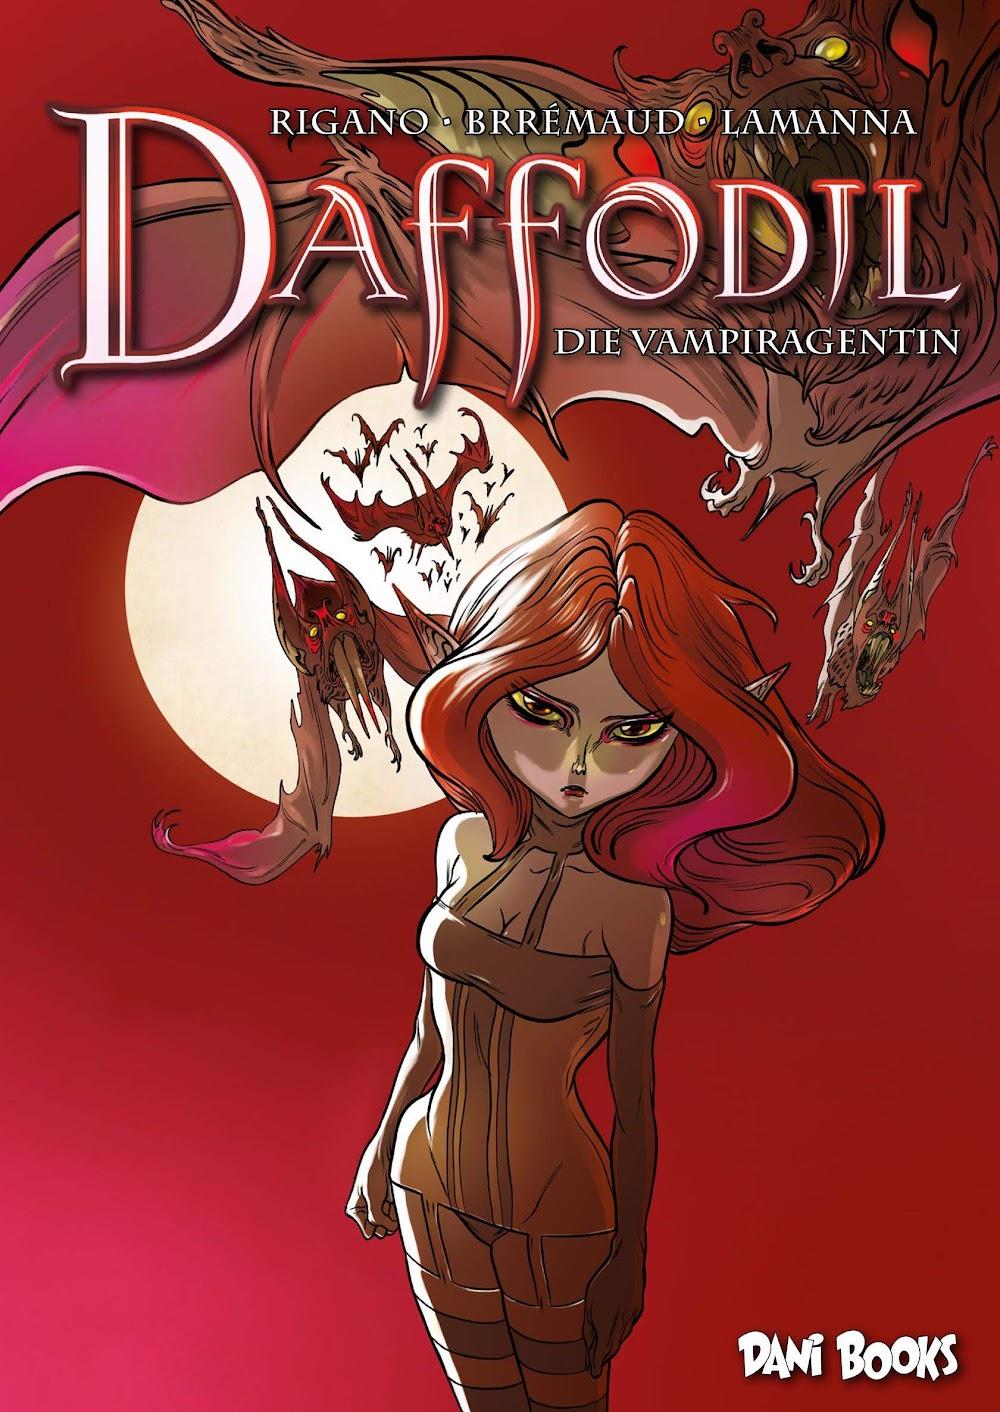 Daffodil - Die Vampiragentin (2013)